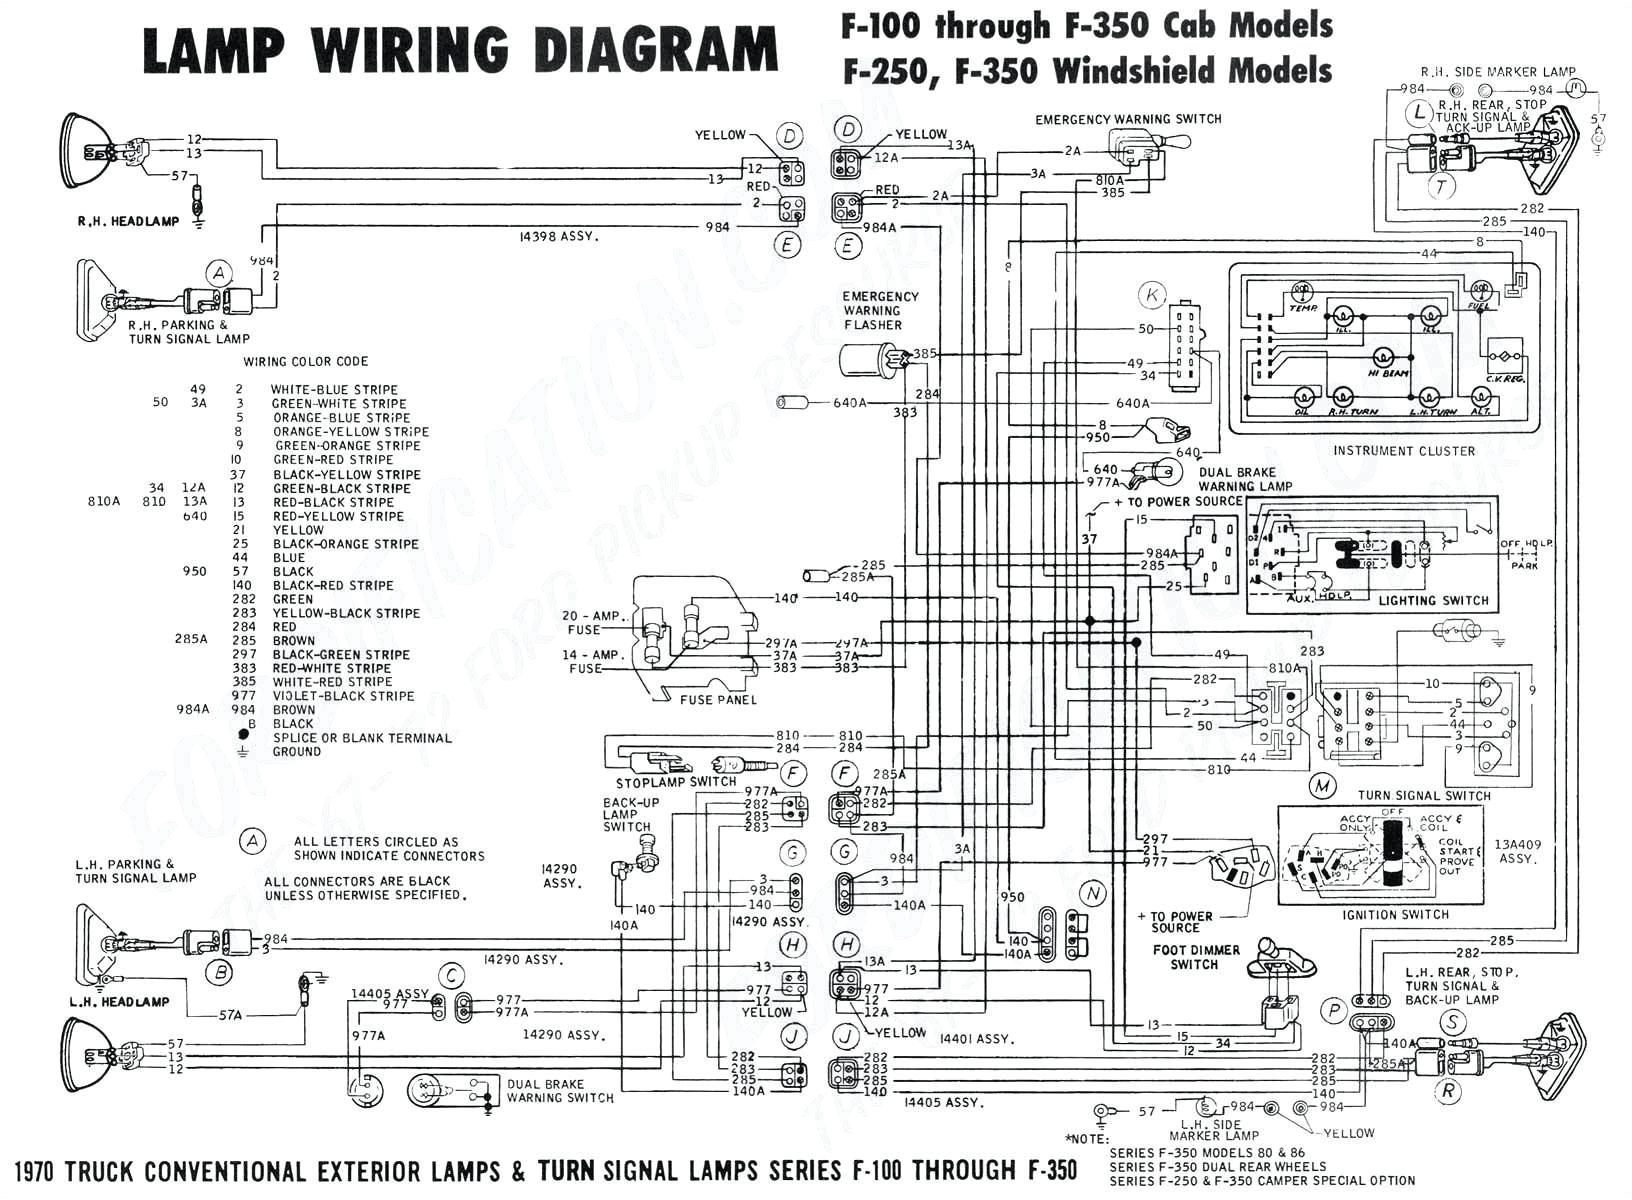 1979 c10 wiring diagram wiring diagram wiring diagram for 1979 chevy silverado as well as trailer wiring